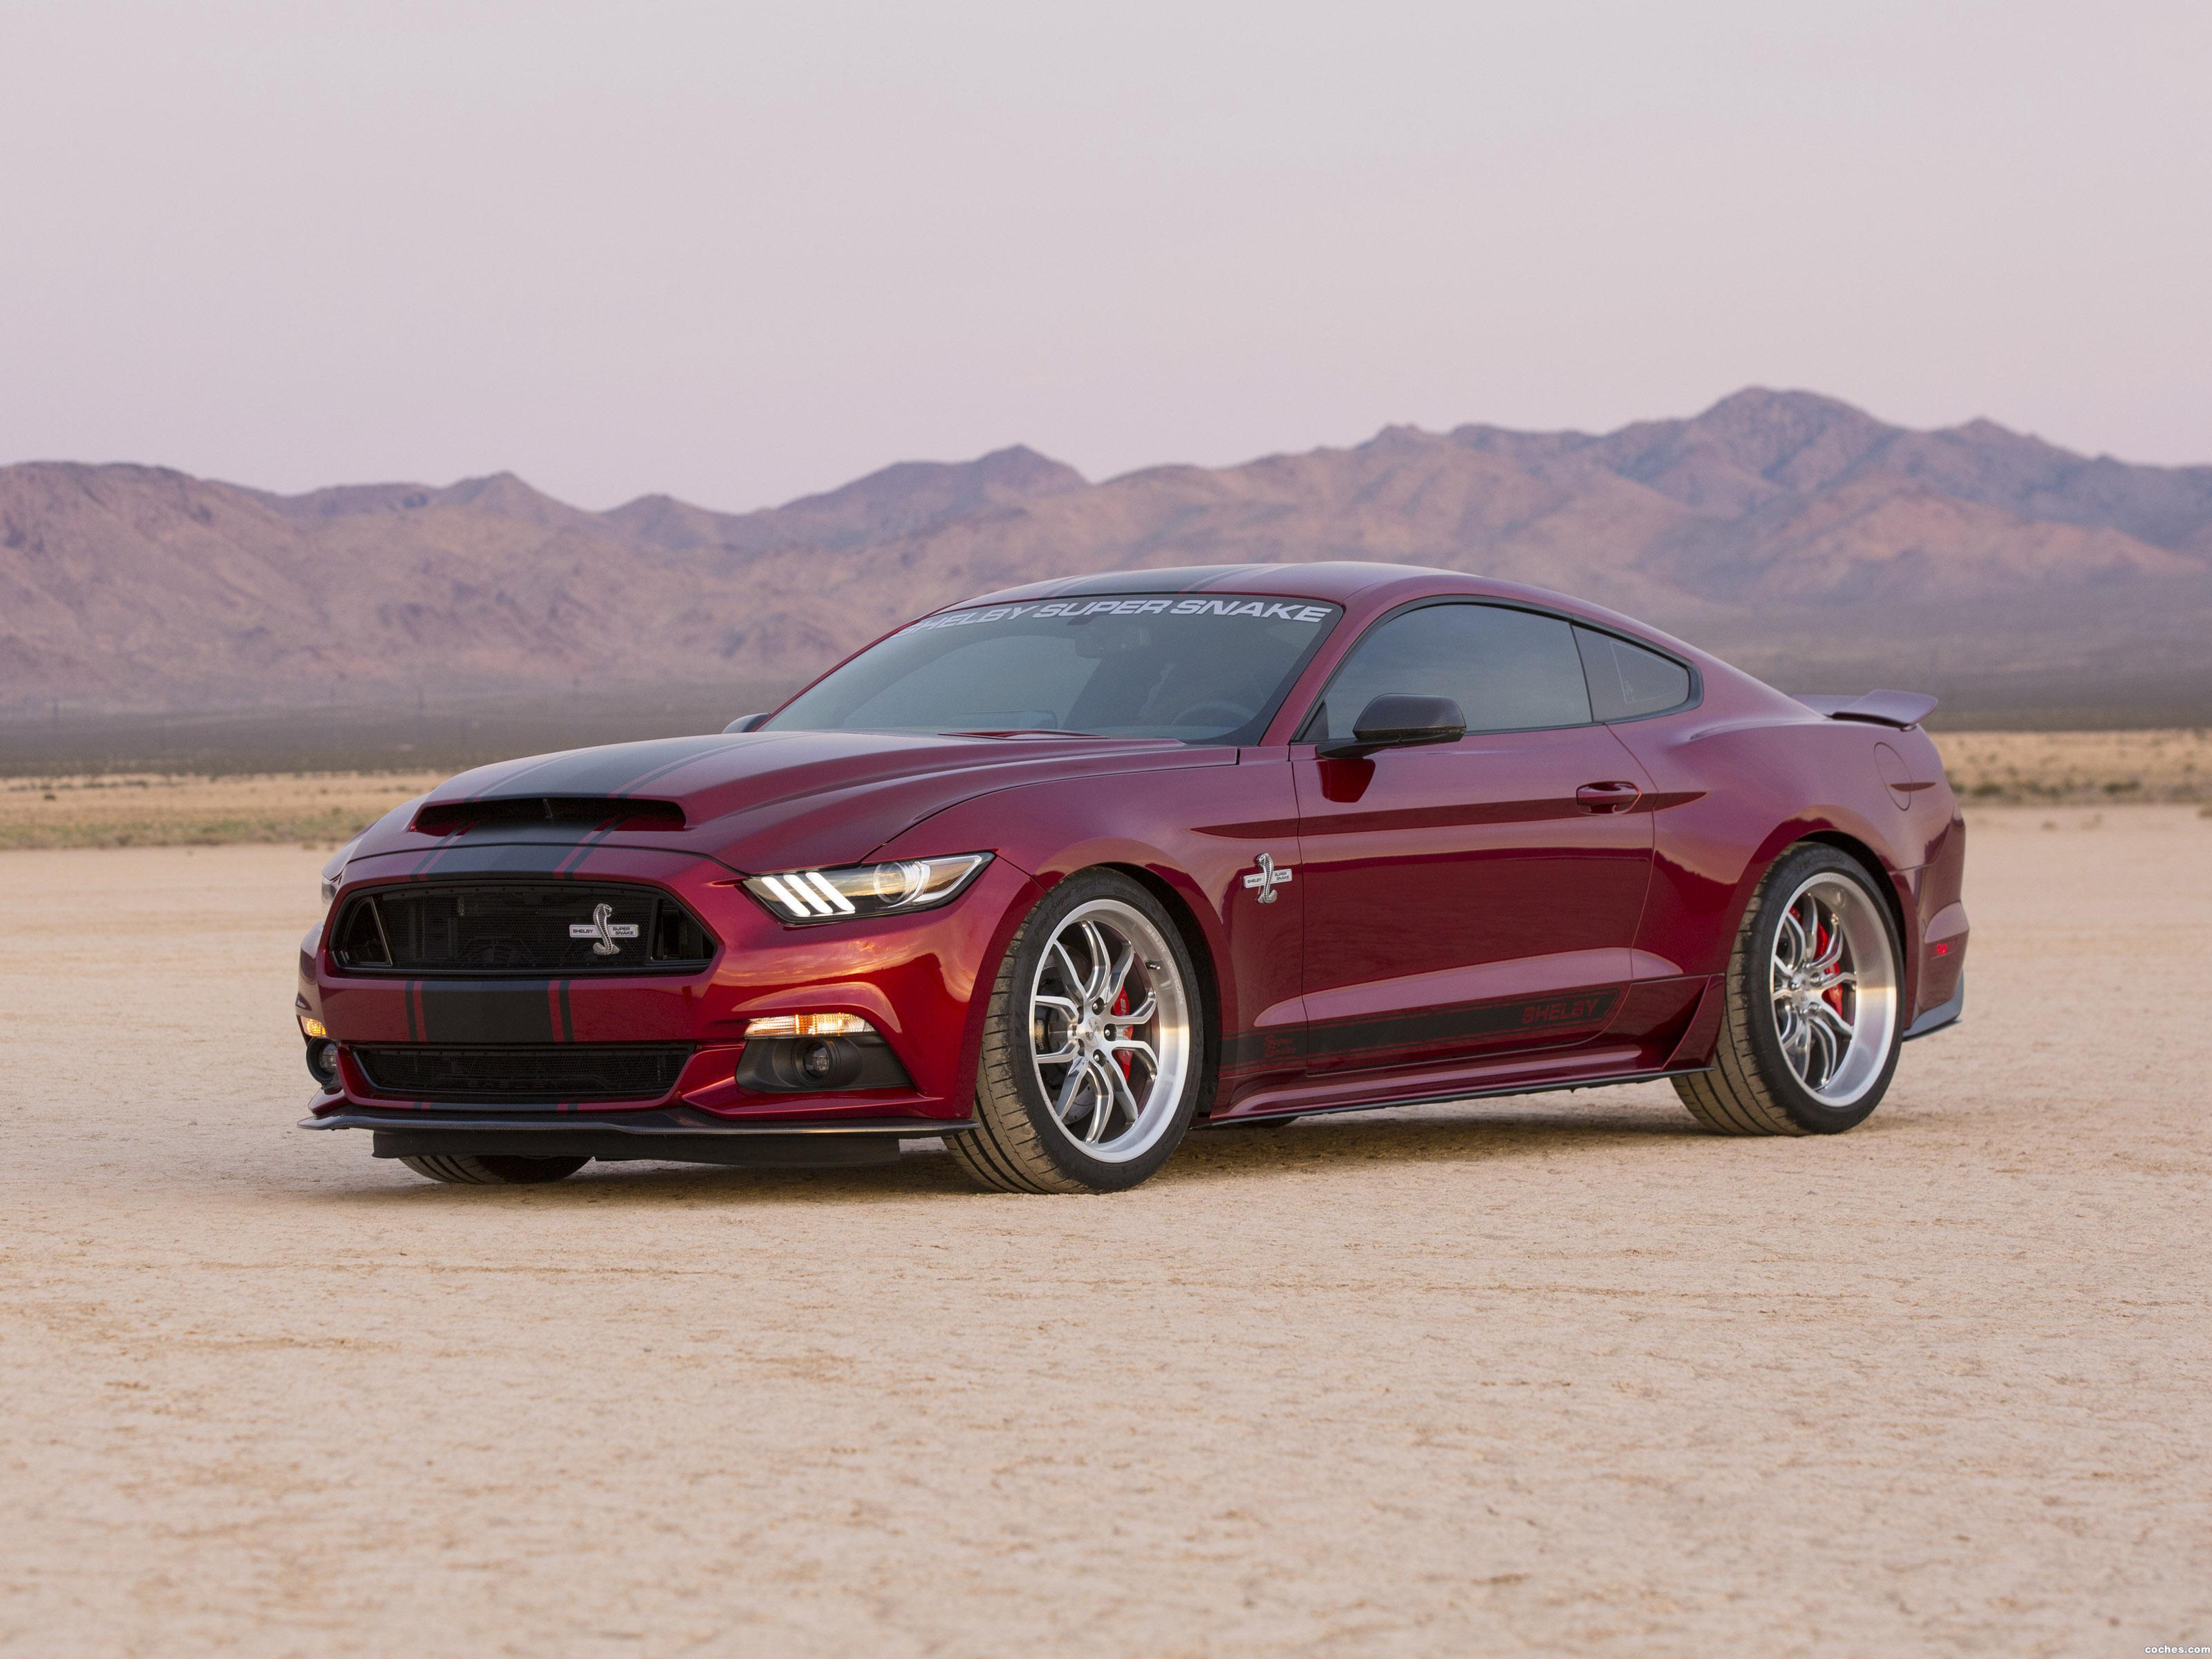 Foto 0 de Shelby Ford Mustang Super Snake 2015